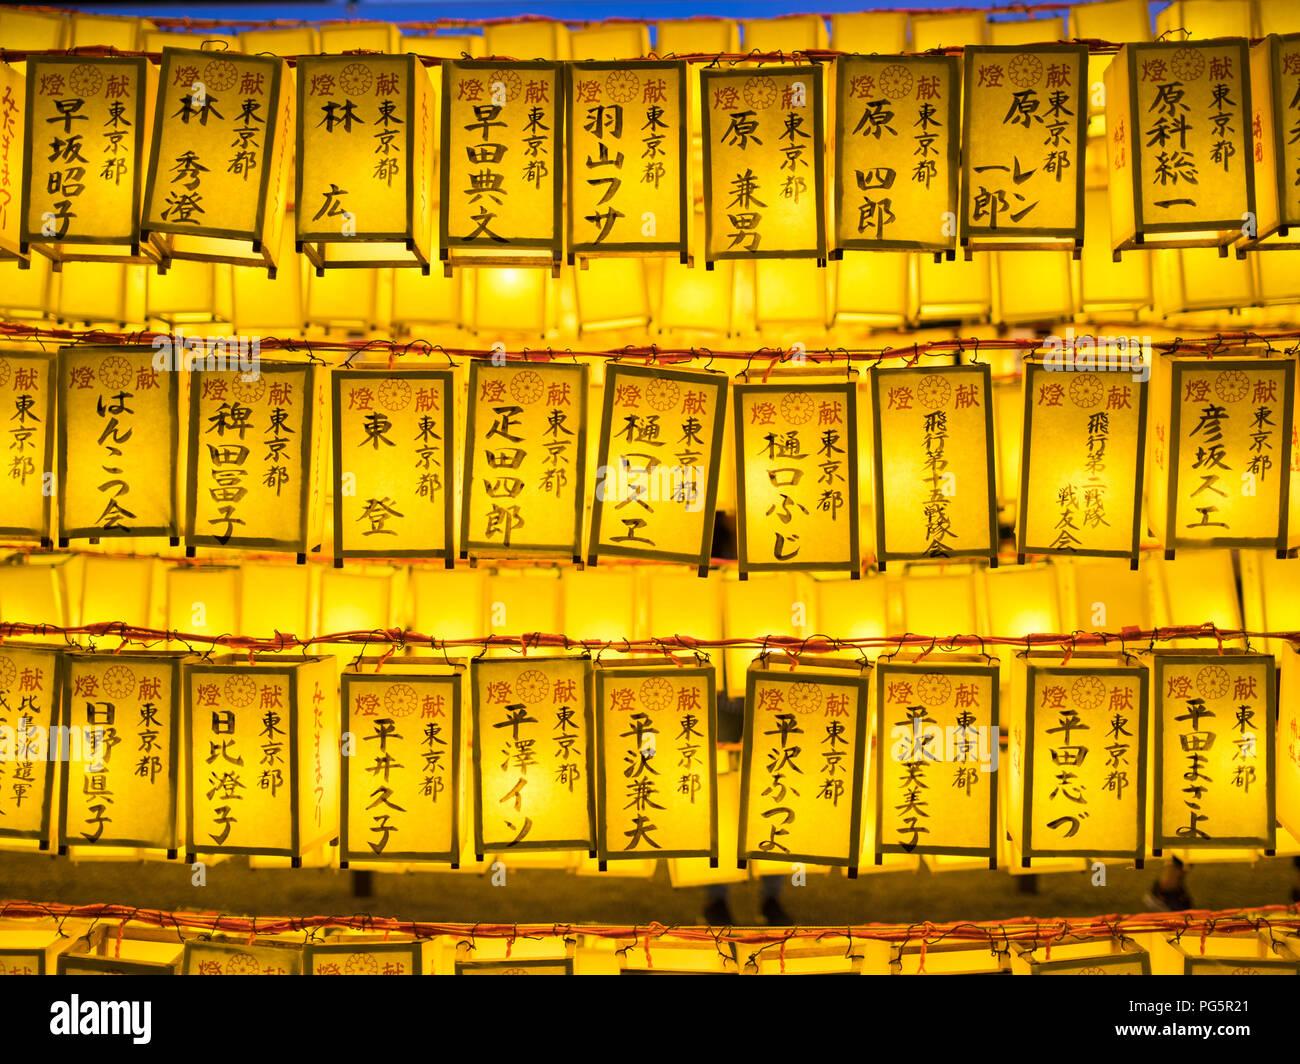 Lanterns of the 2018 Mitama Matsuri (Mitama Festival), a famous Japanese Obon (Bon) summer festival. Yasukuni Shrine, Ichigaya, Tokyo, Japan. - Stock Image